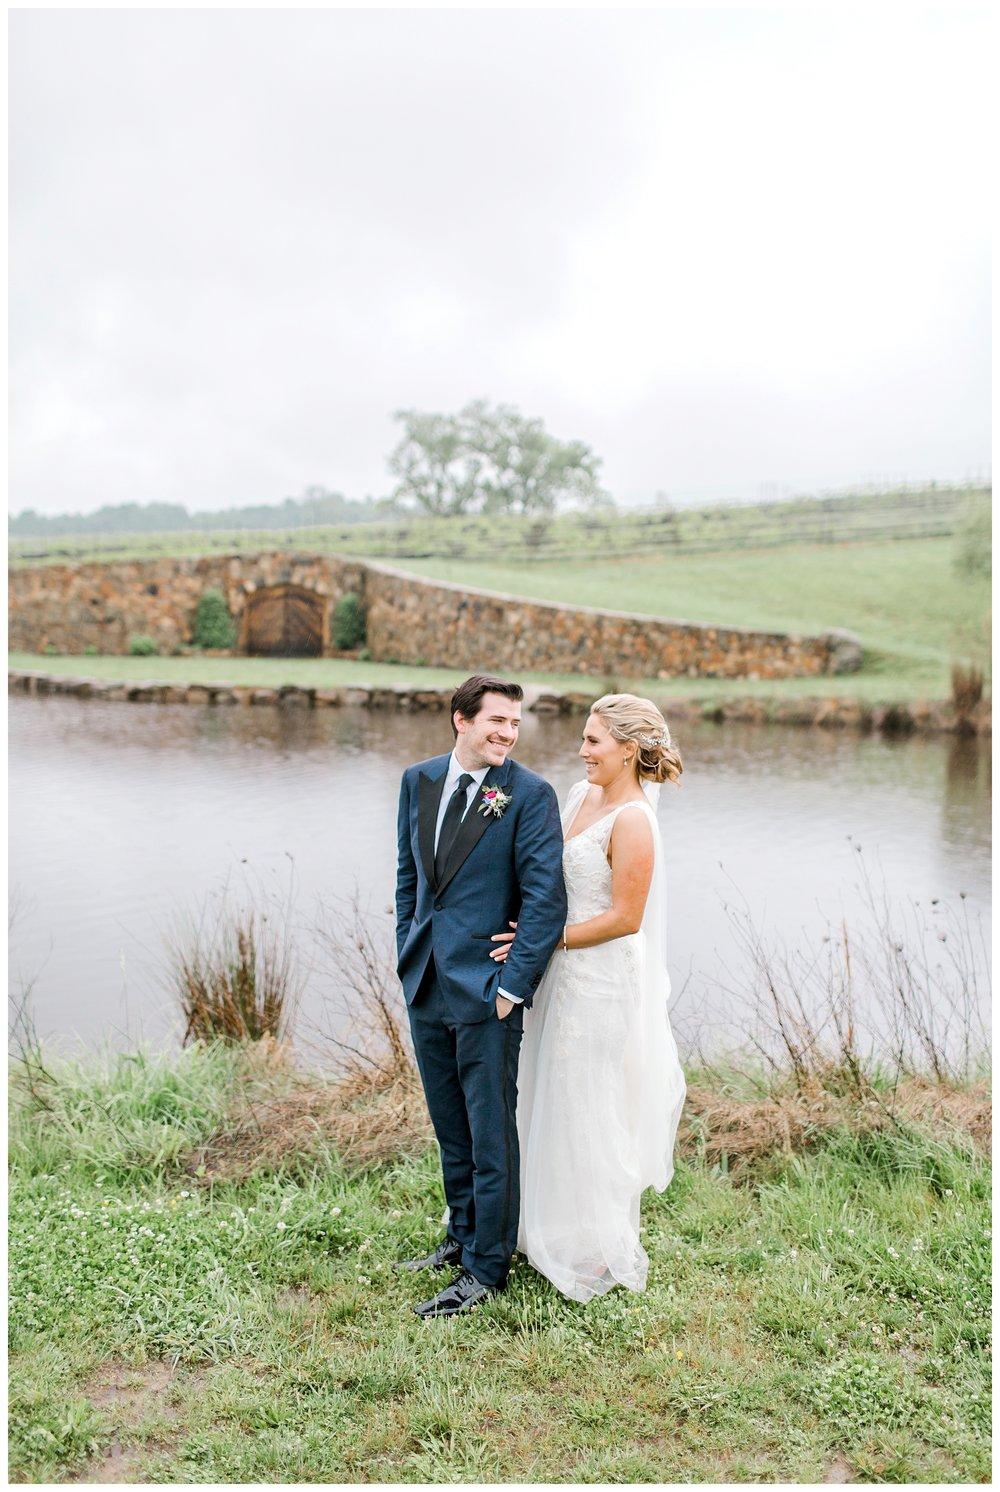 Stone Tower Winery Wedding Virginia Wedding Photographer_0099.jpg